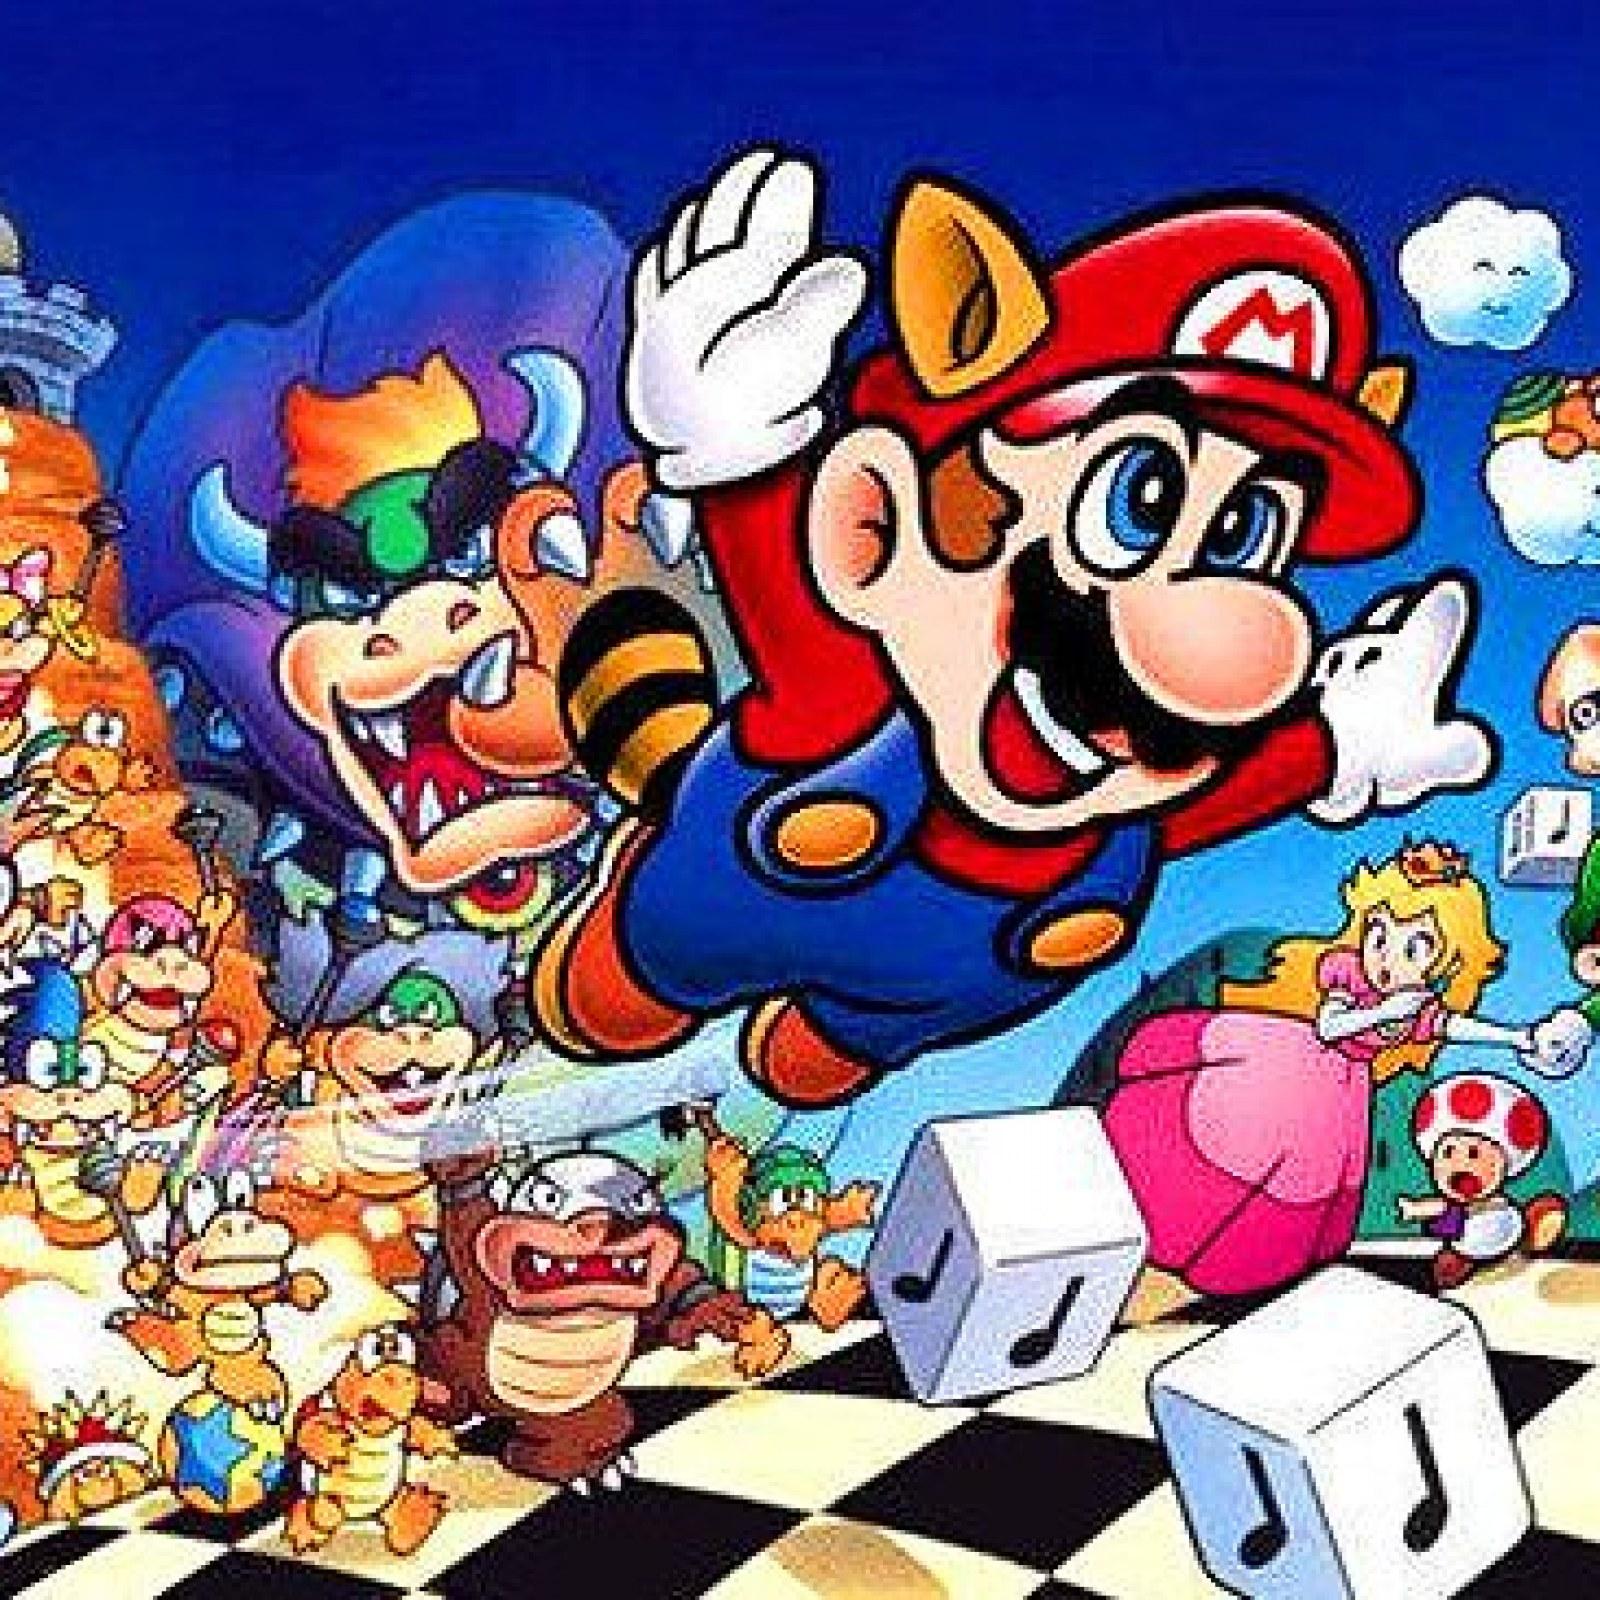 Super Mario Bros Animated Movie Eyeing 2022 Release